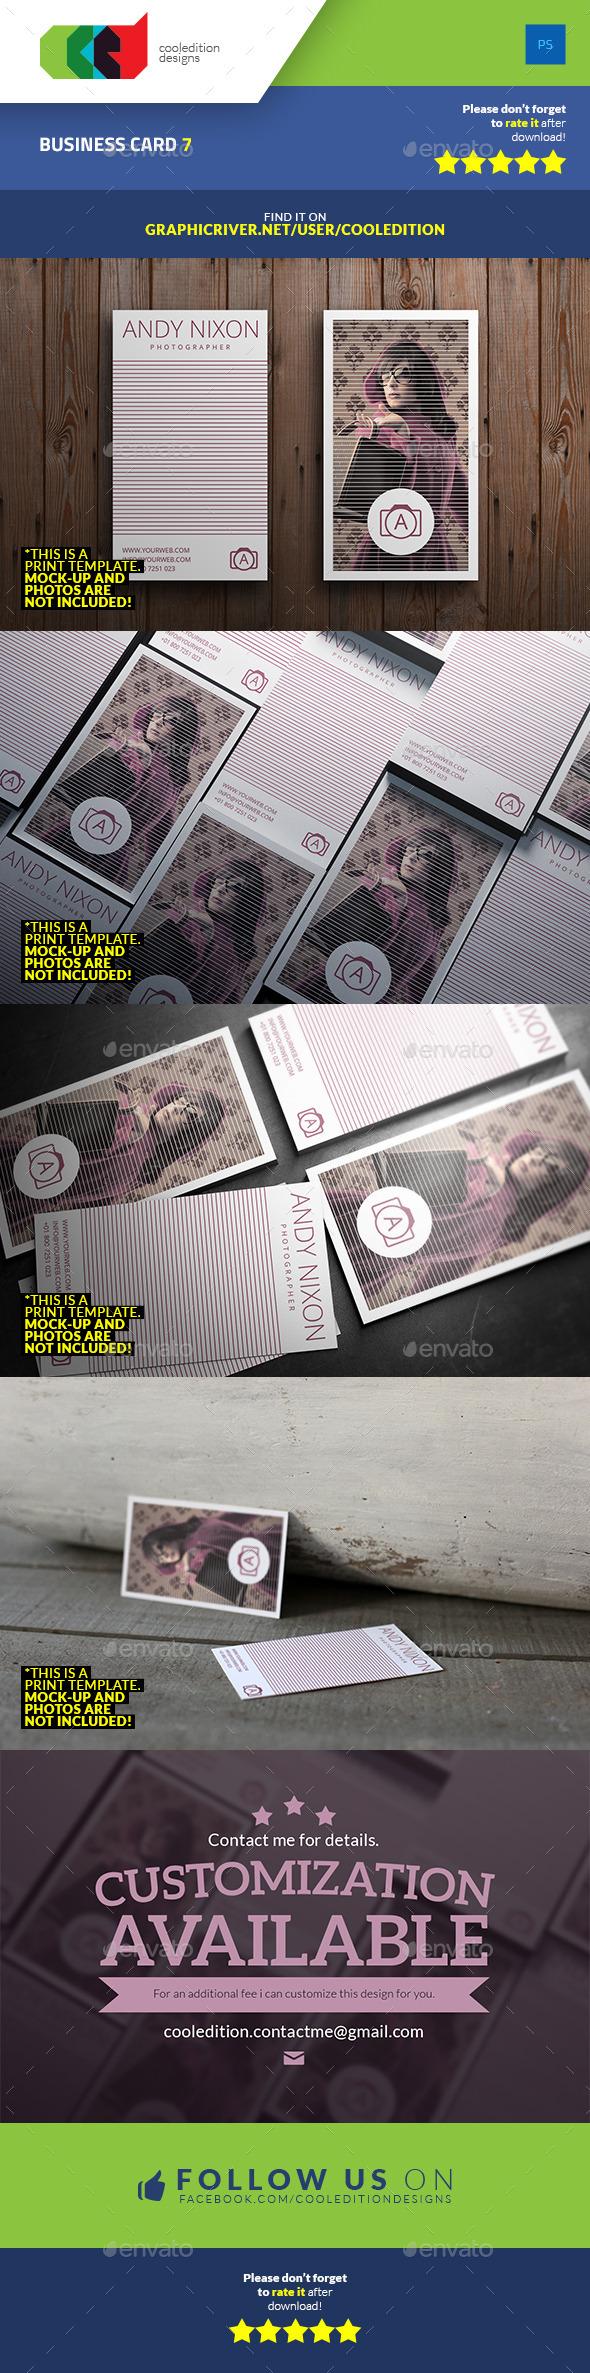 Business Card 7 - Retro/Vintage Business Cards